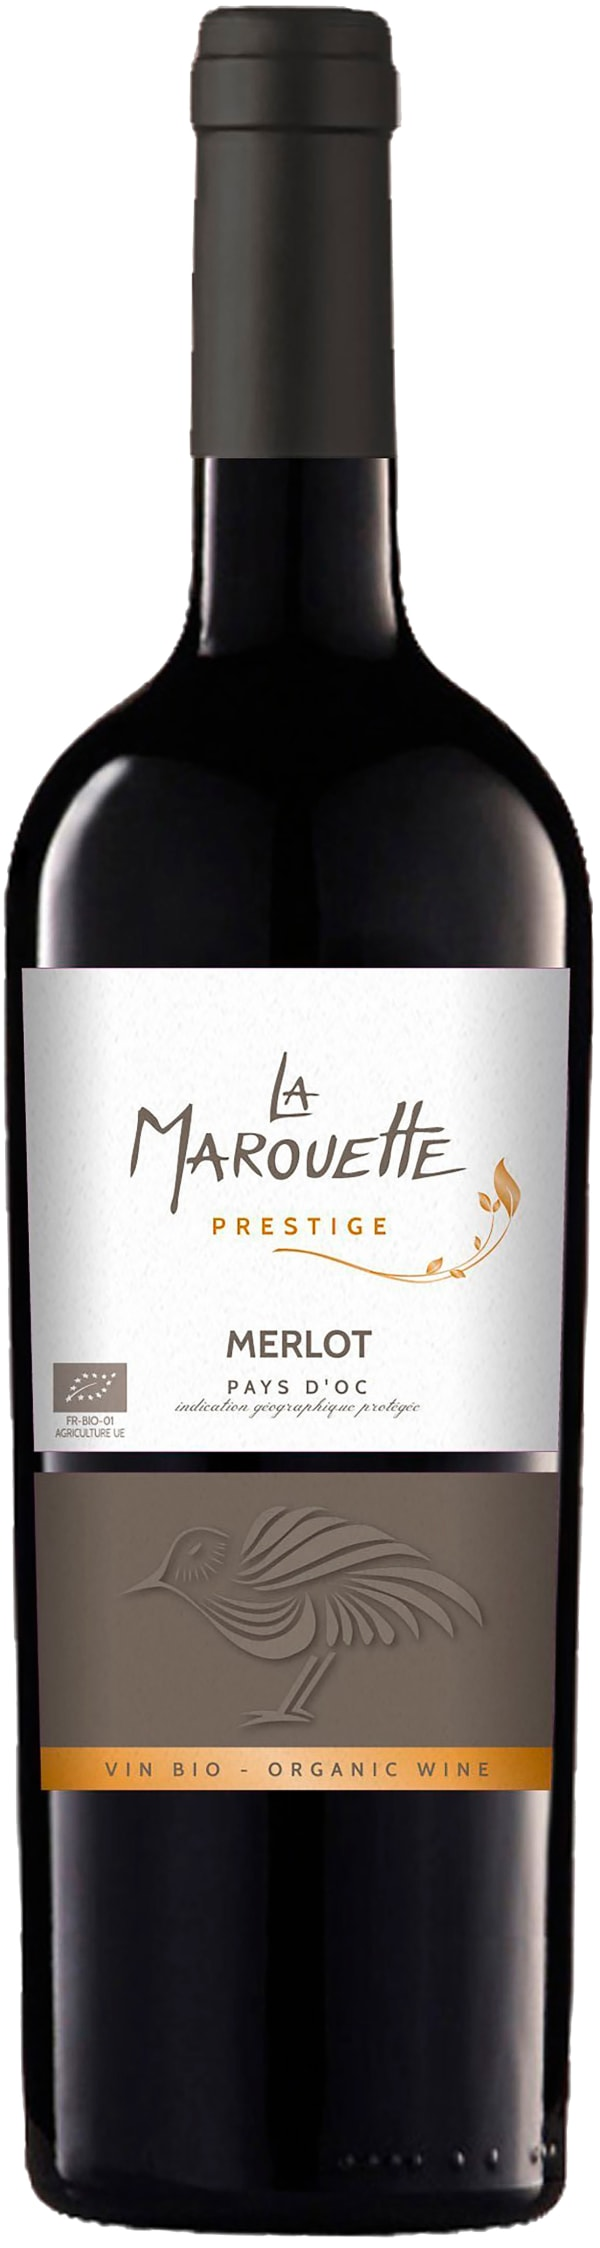 La Marouette Prestige Organic Merlot 2017